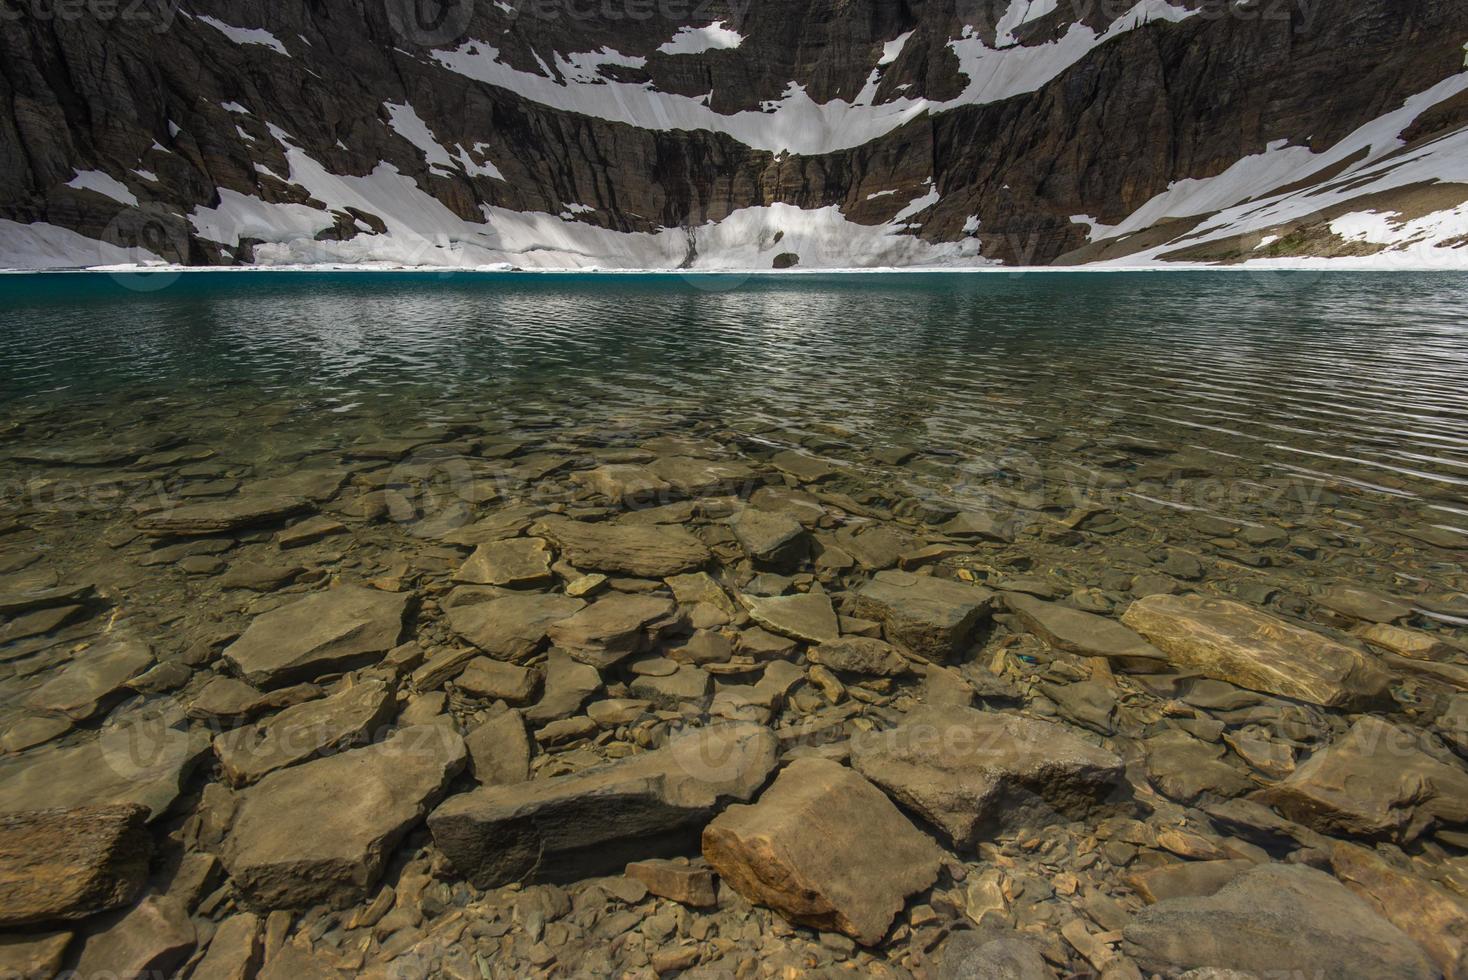 lac iceberg, photo